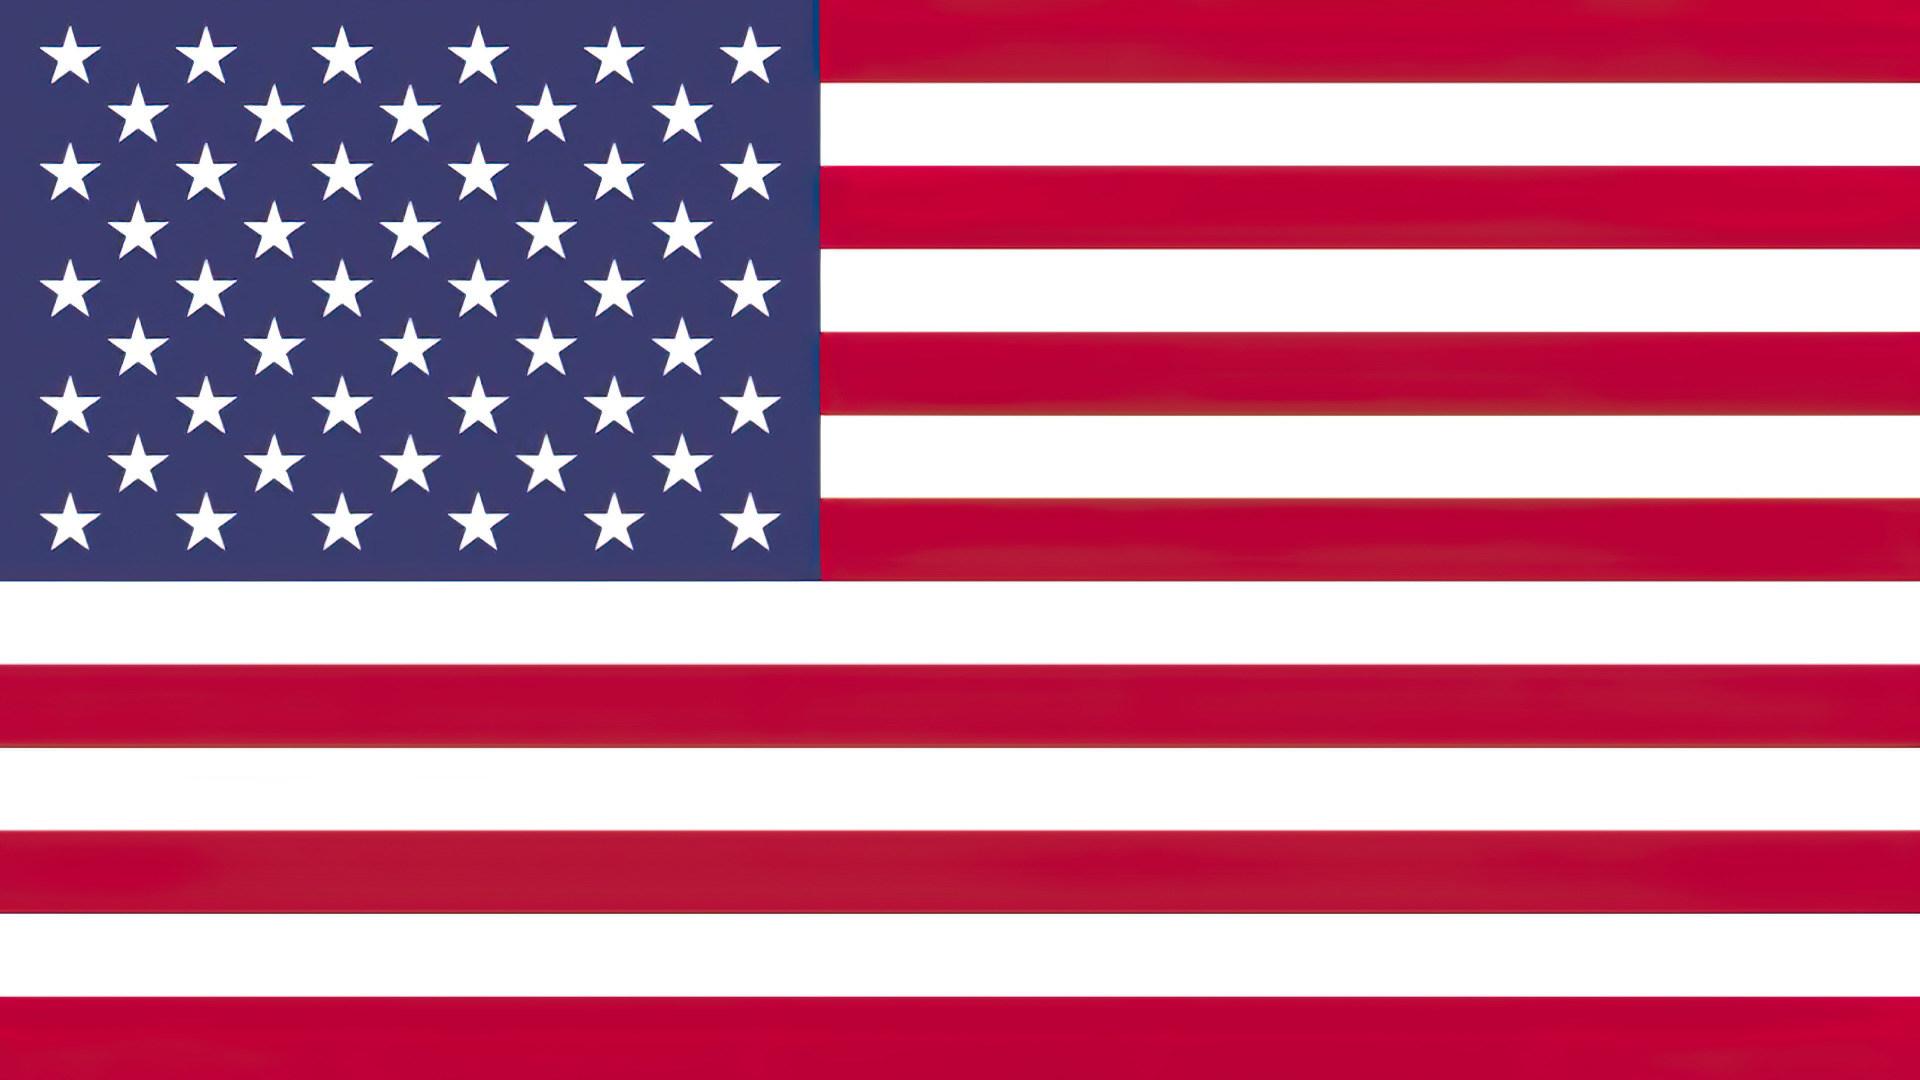 Usa, Flagge, Nationalflagge, Staatsflagge